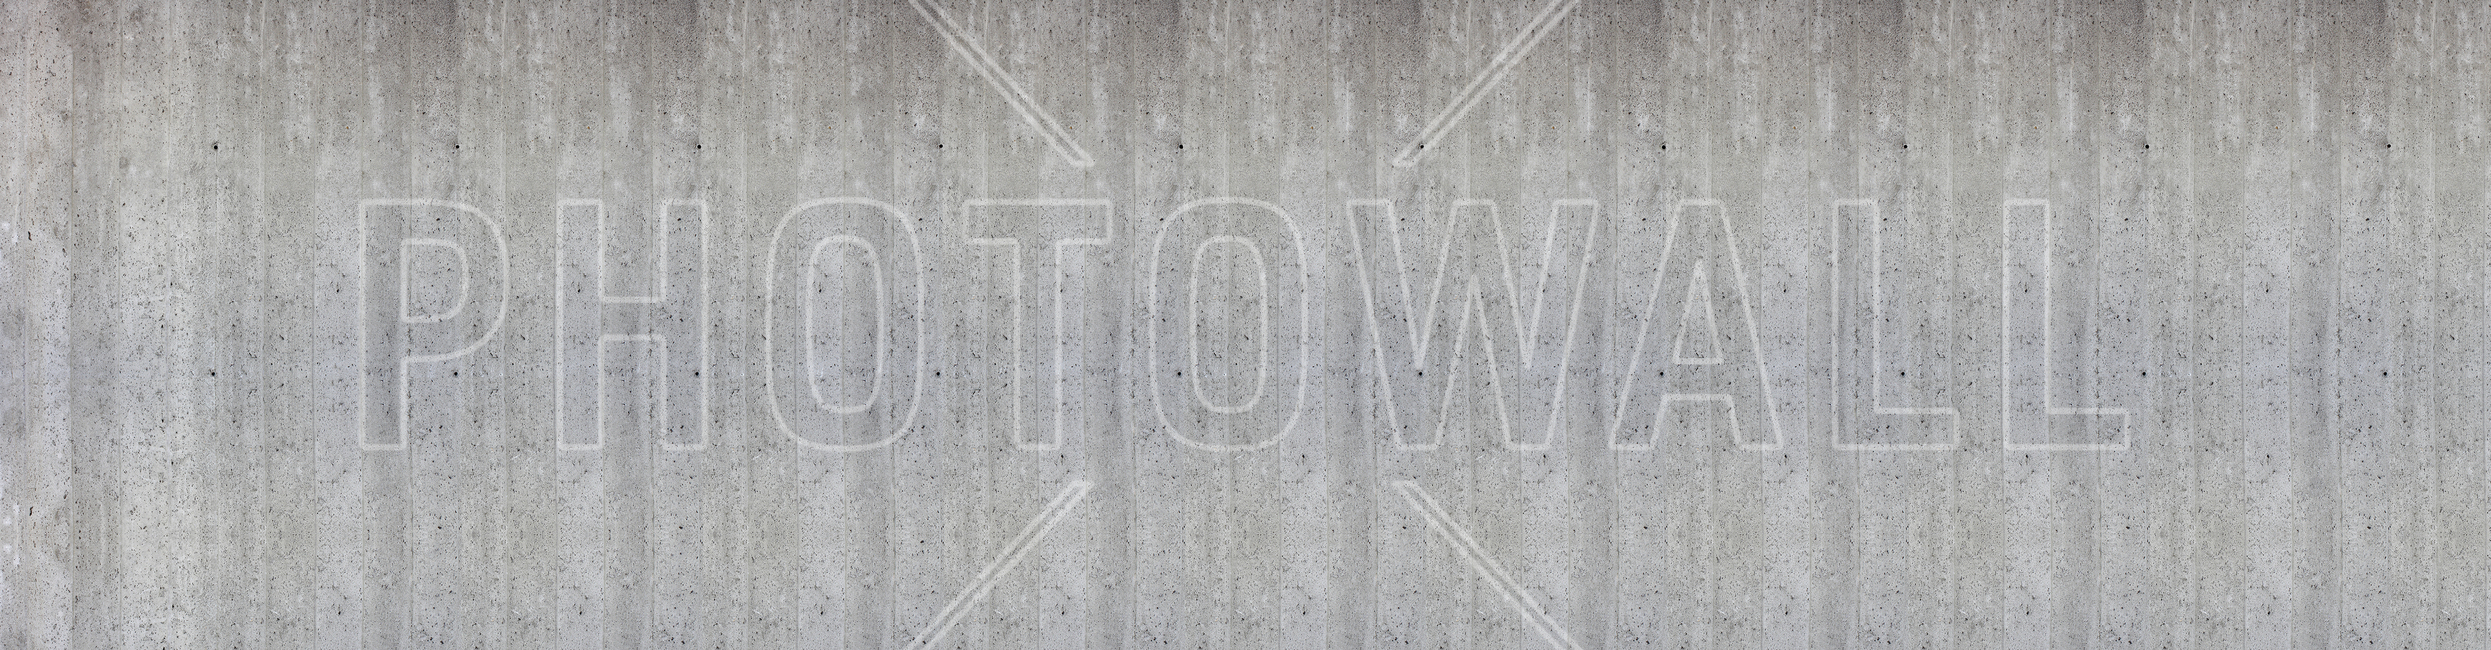 Concrete Wall Fototapeter & Tapeter 100 x 100 cm